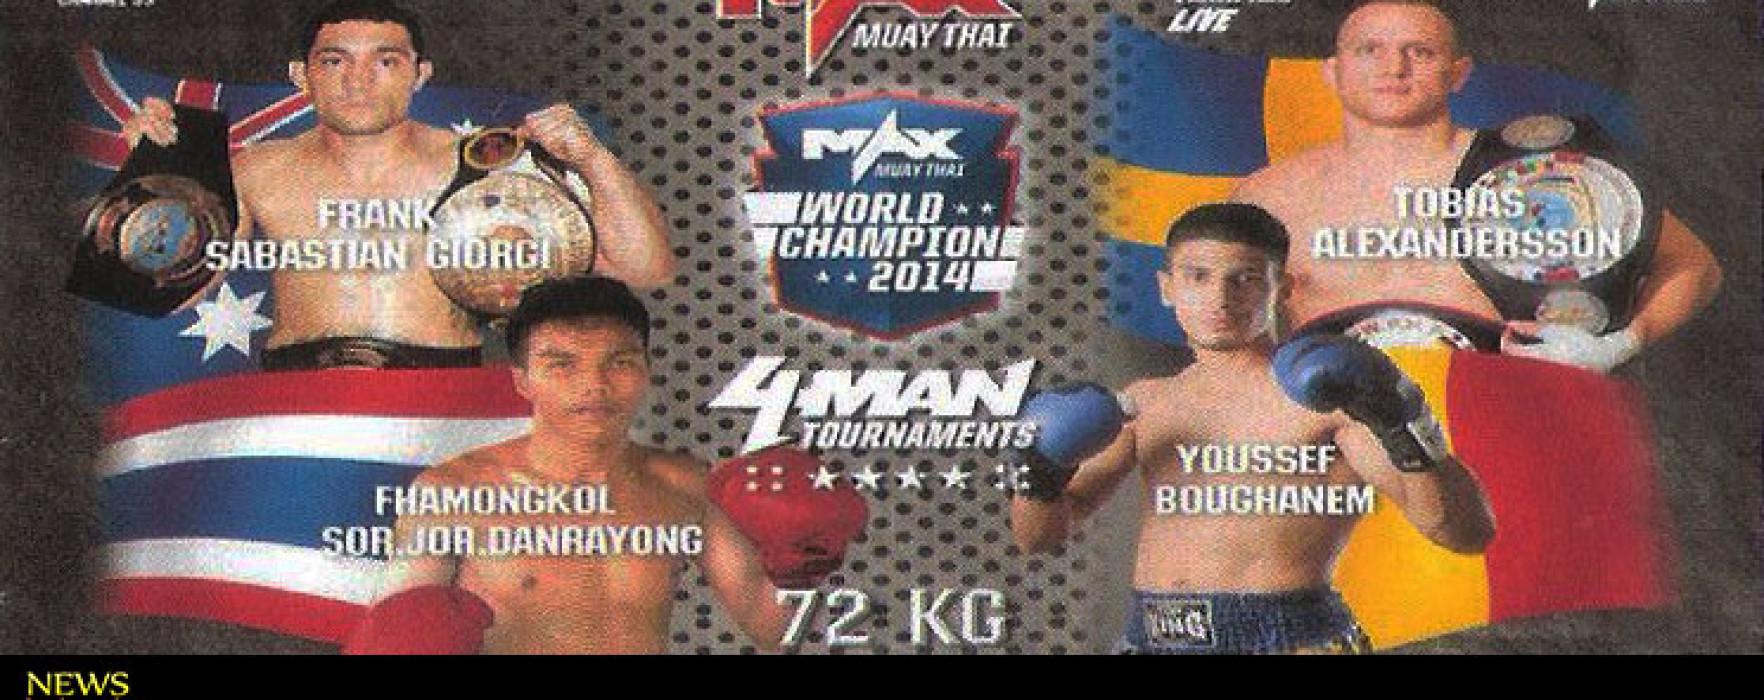 Card: Max Muay Thai World con Frank Giorgi, Fahmongkol, Jomthong, kanonguk, Vahid Shahbazi ecc